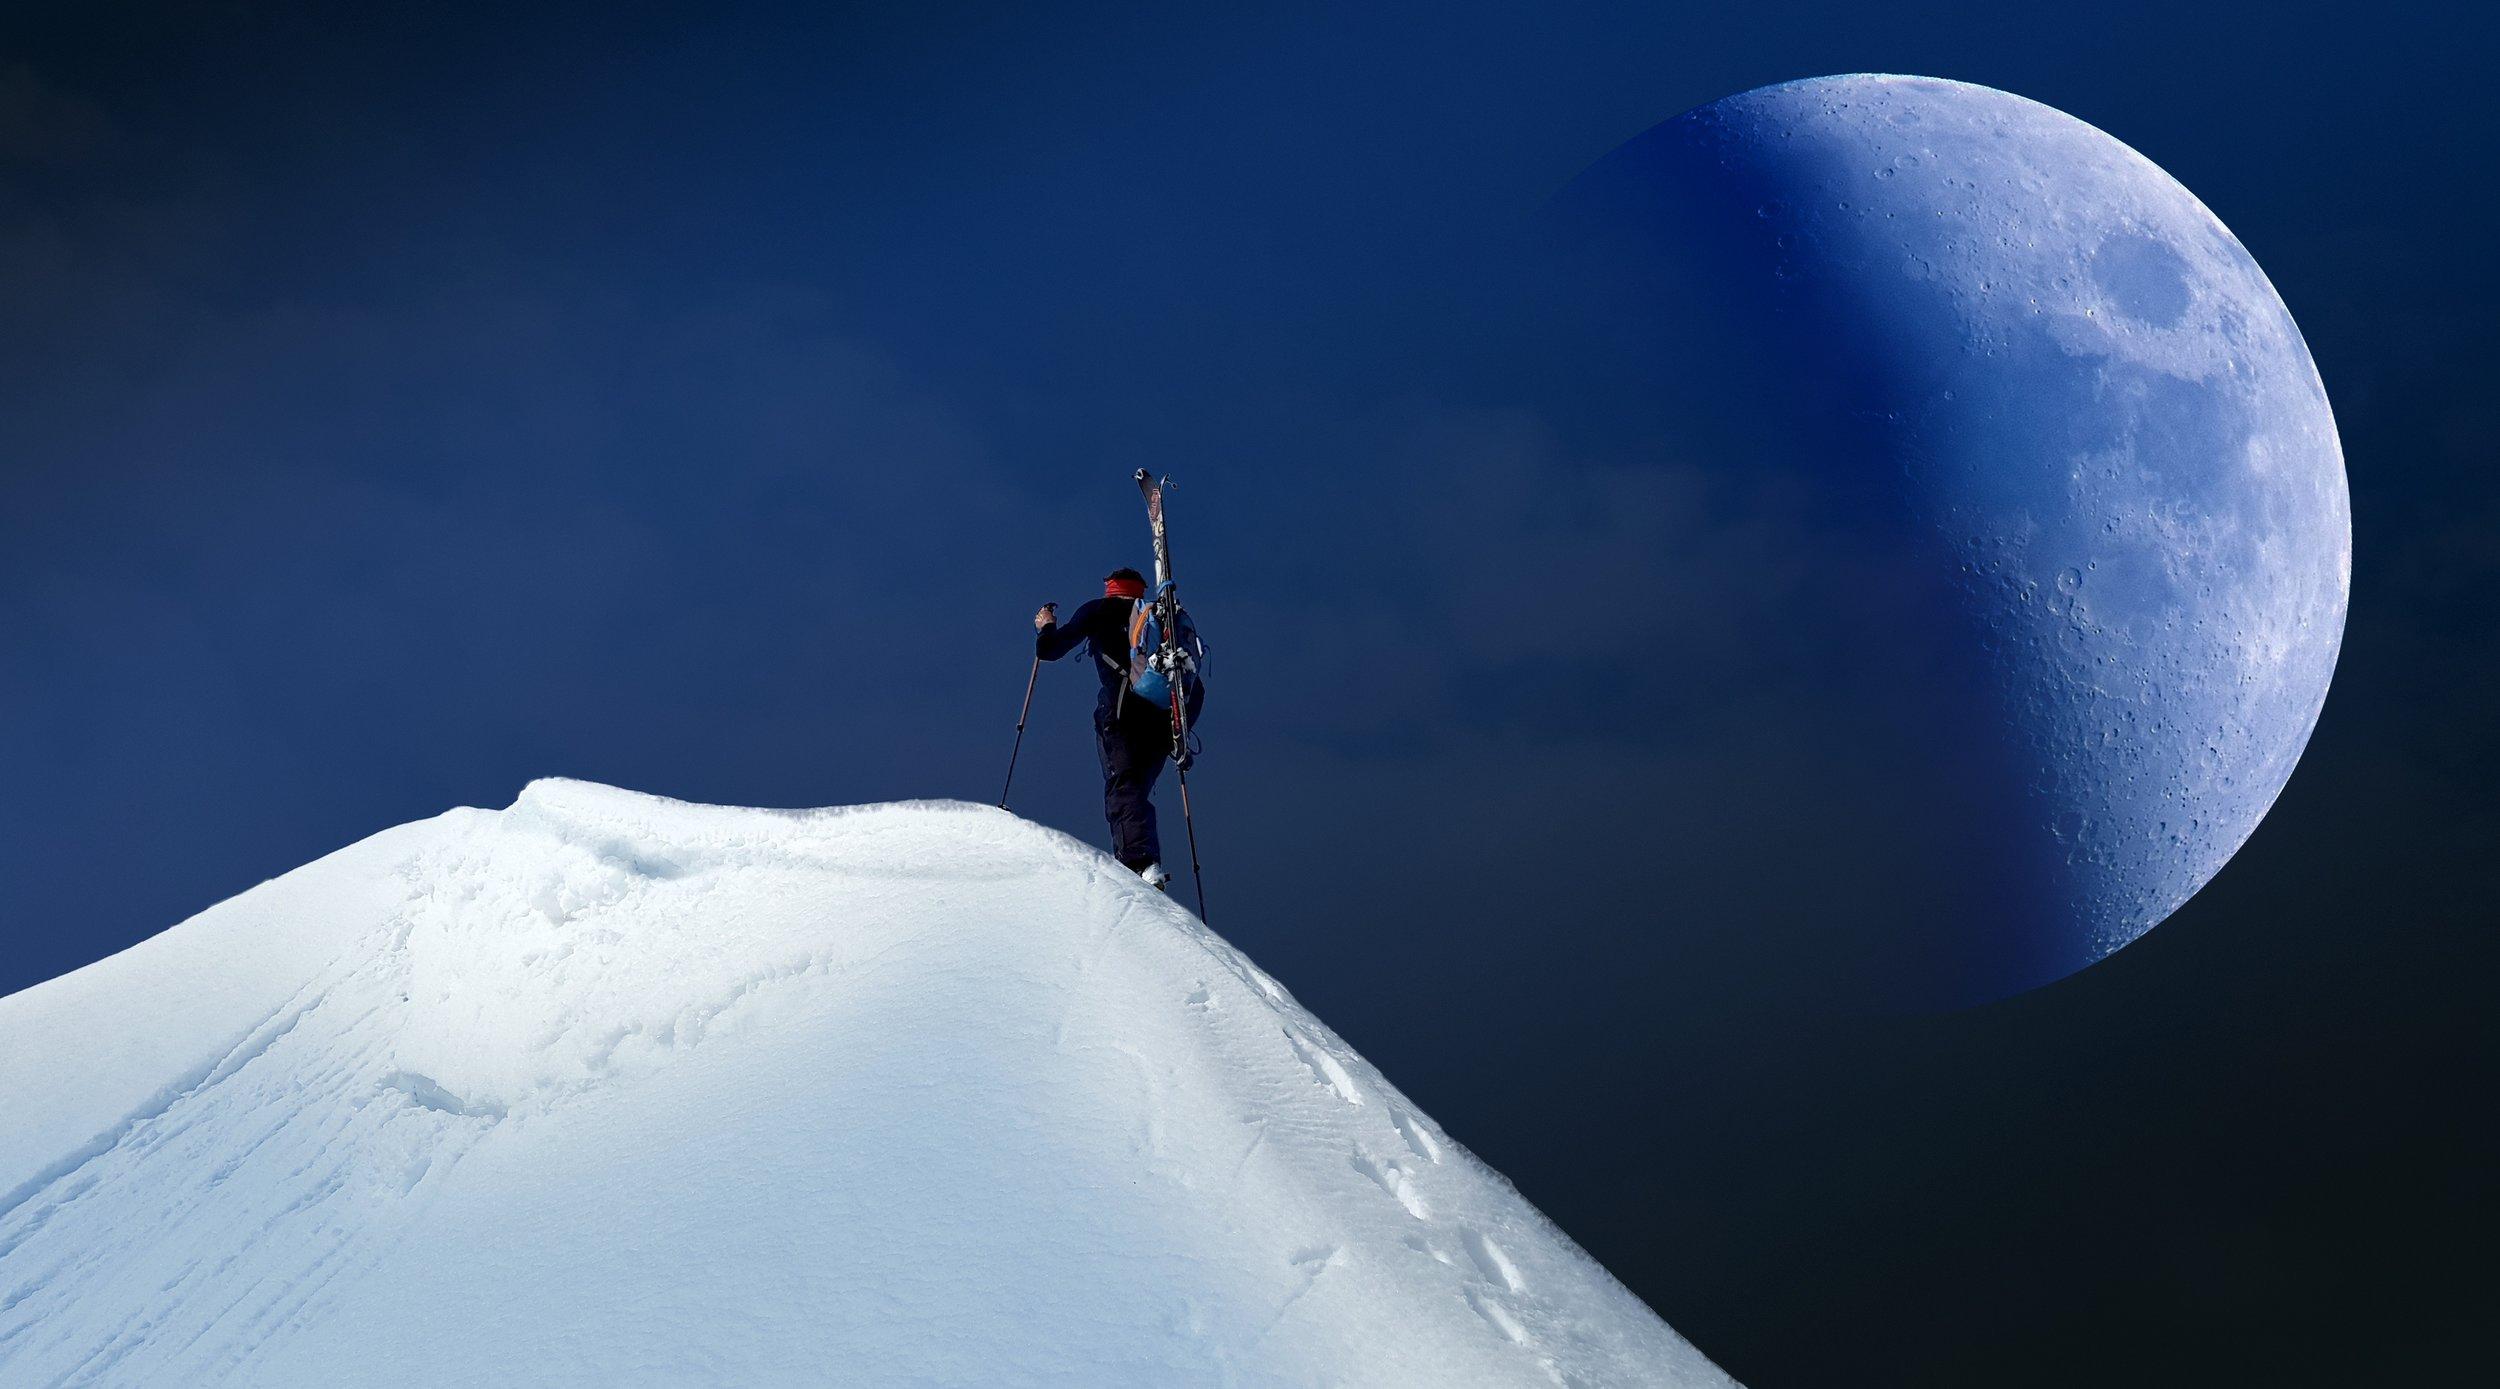 moon2.jpeg